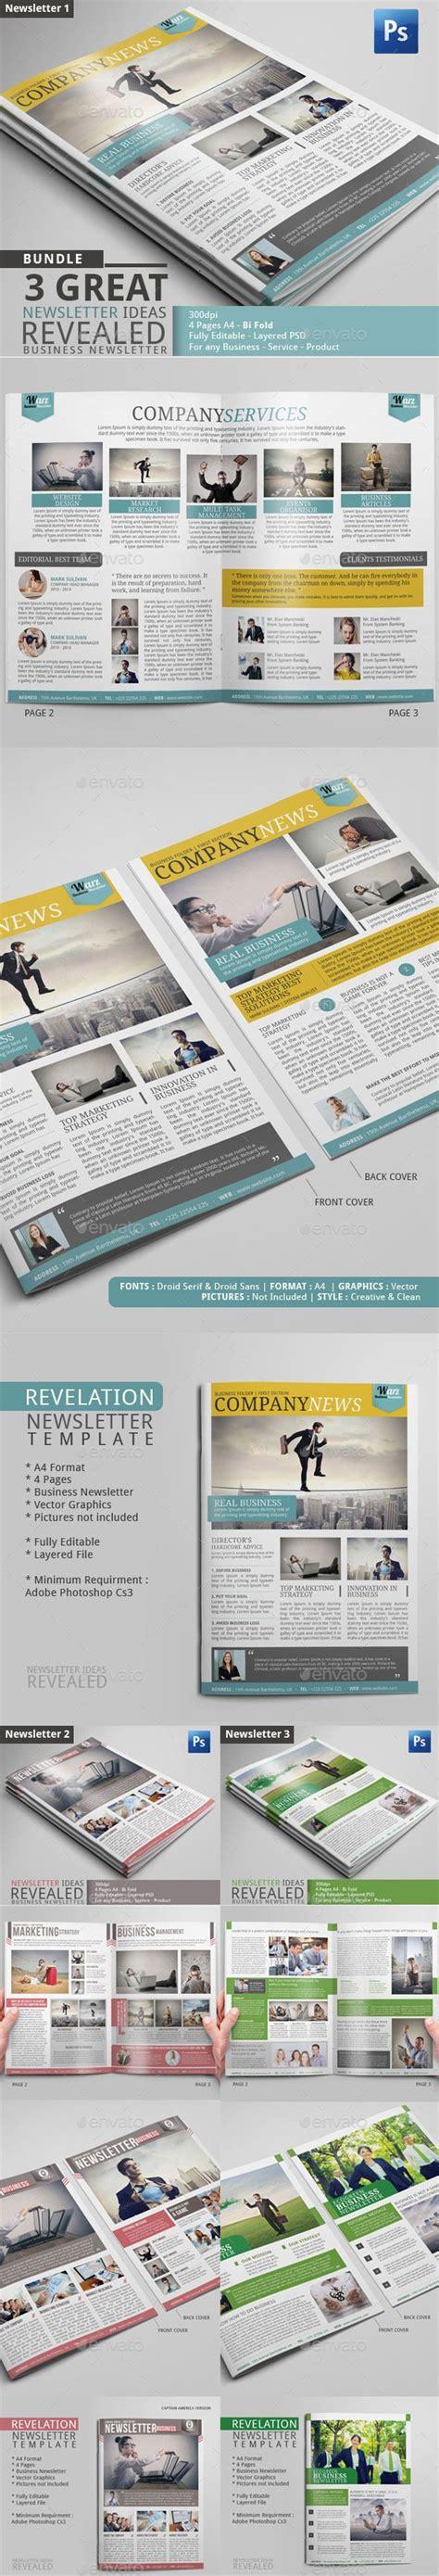 21 Best Ideas About Newsletter Exles Adobe Photoshop On Pinterest Newsletter Templates Print Newsletter Templates Photoshop